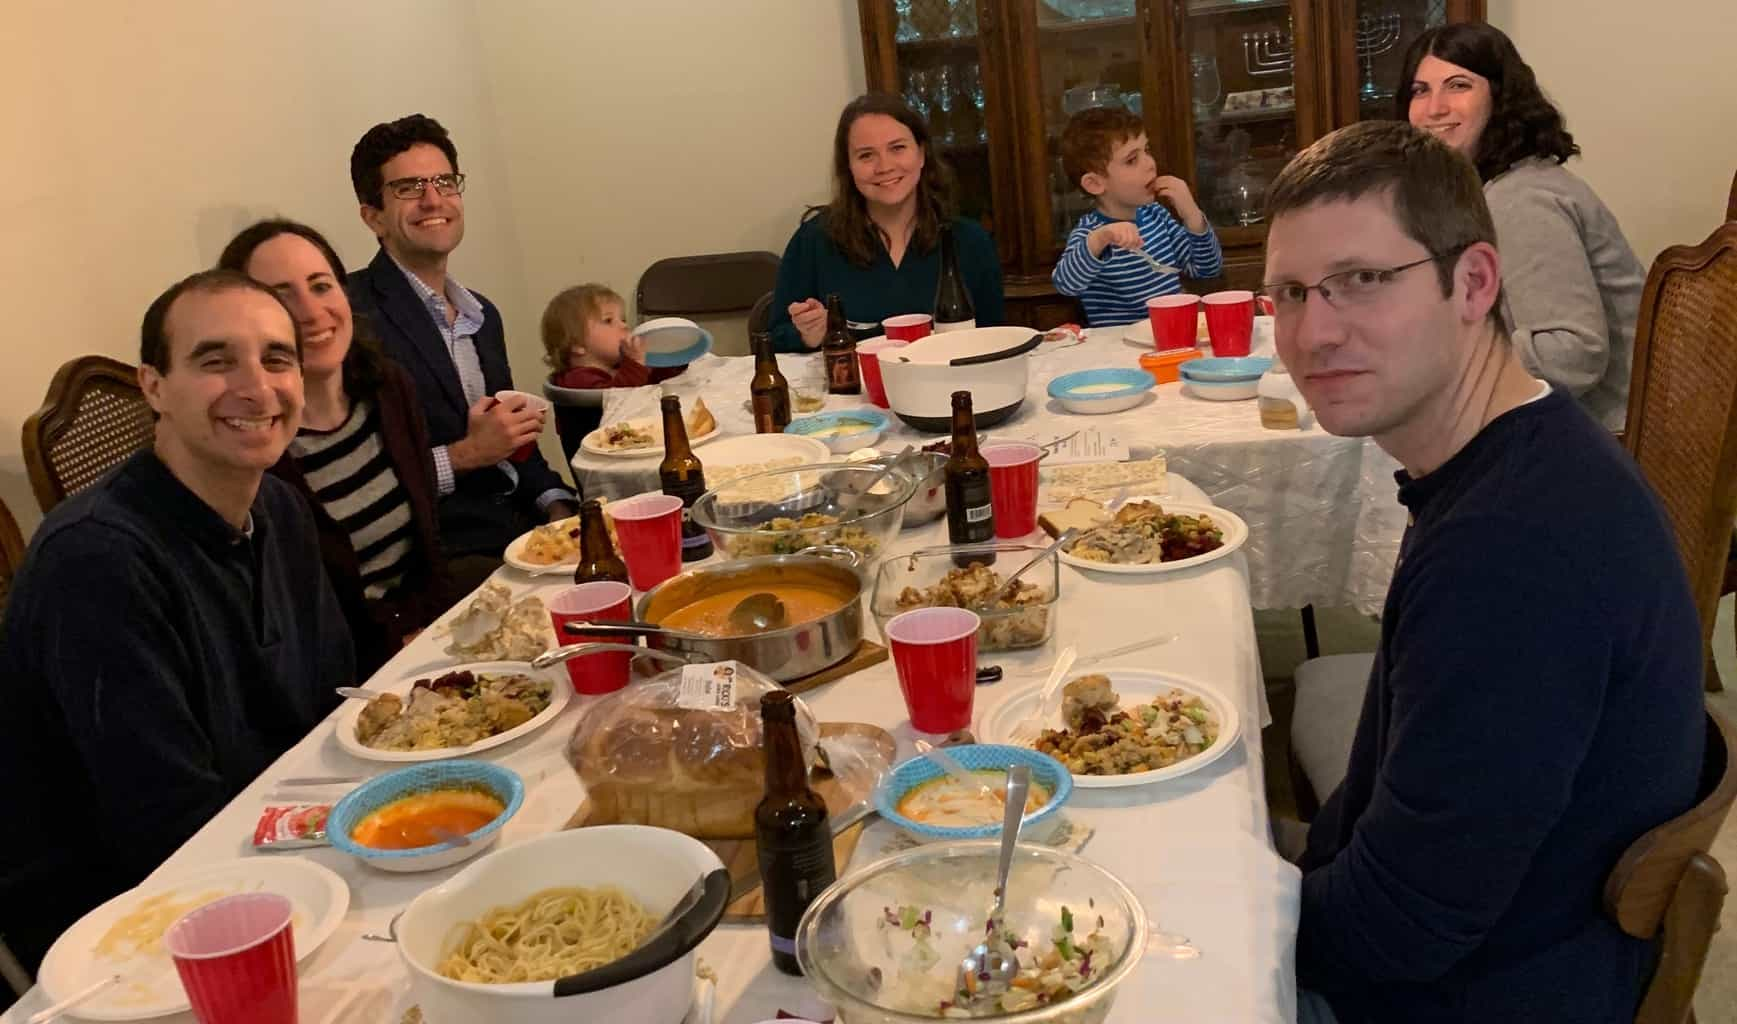 free-jewish-books-bring-families-together